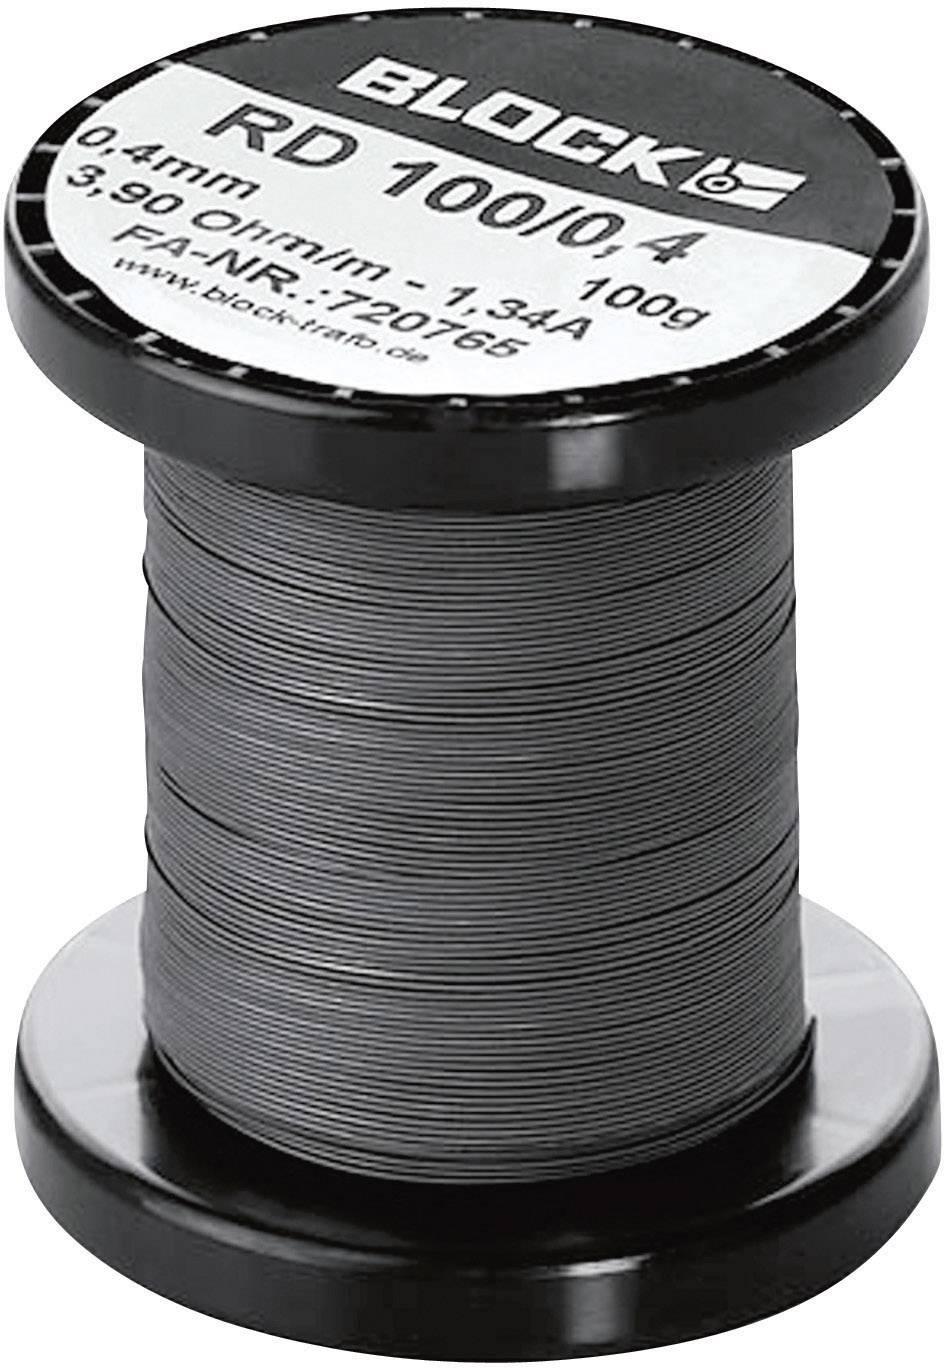 Odporový drát (konstantan) Block RD 100/1,5, 0.277 Ω/m, 6.3 m